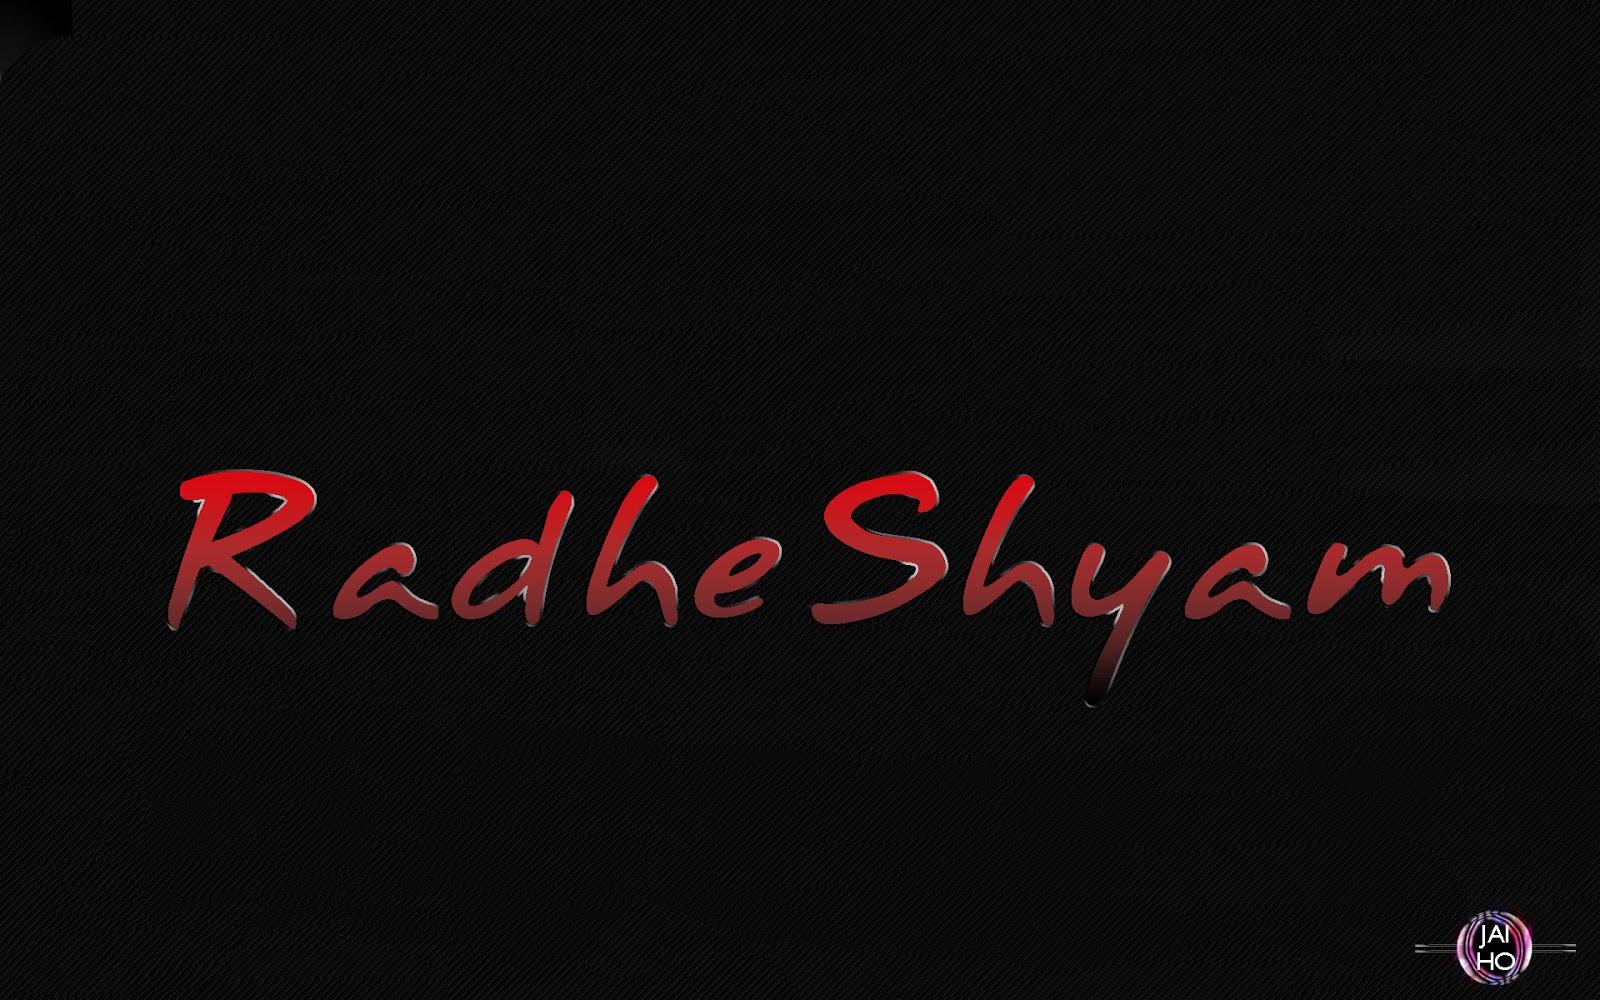 Radhe Shyam Hd Wallpaper In 2d 1920x1200 Free